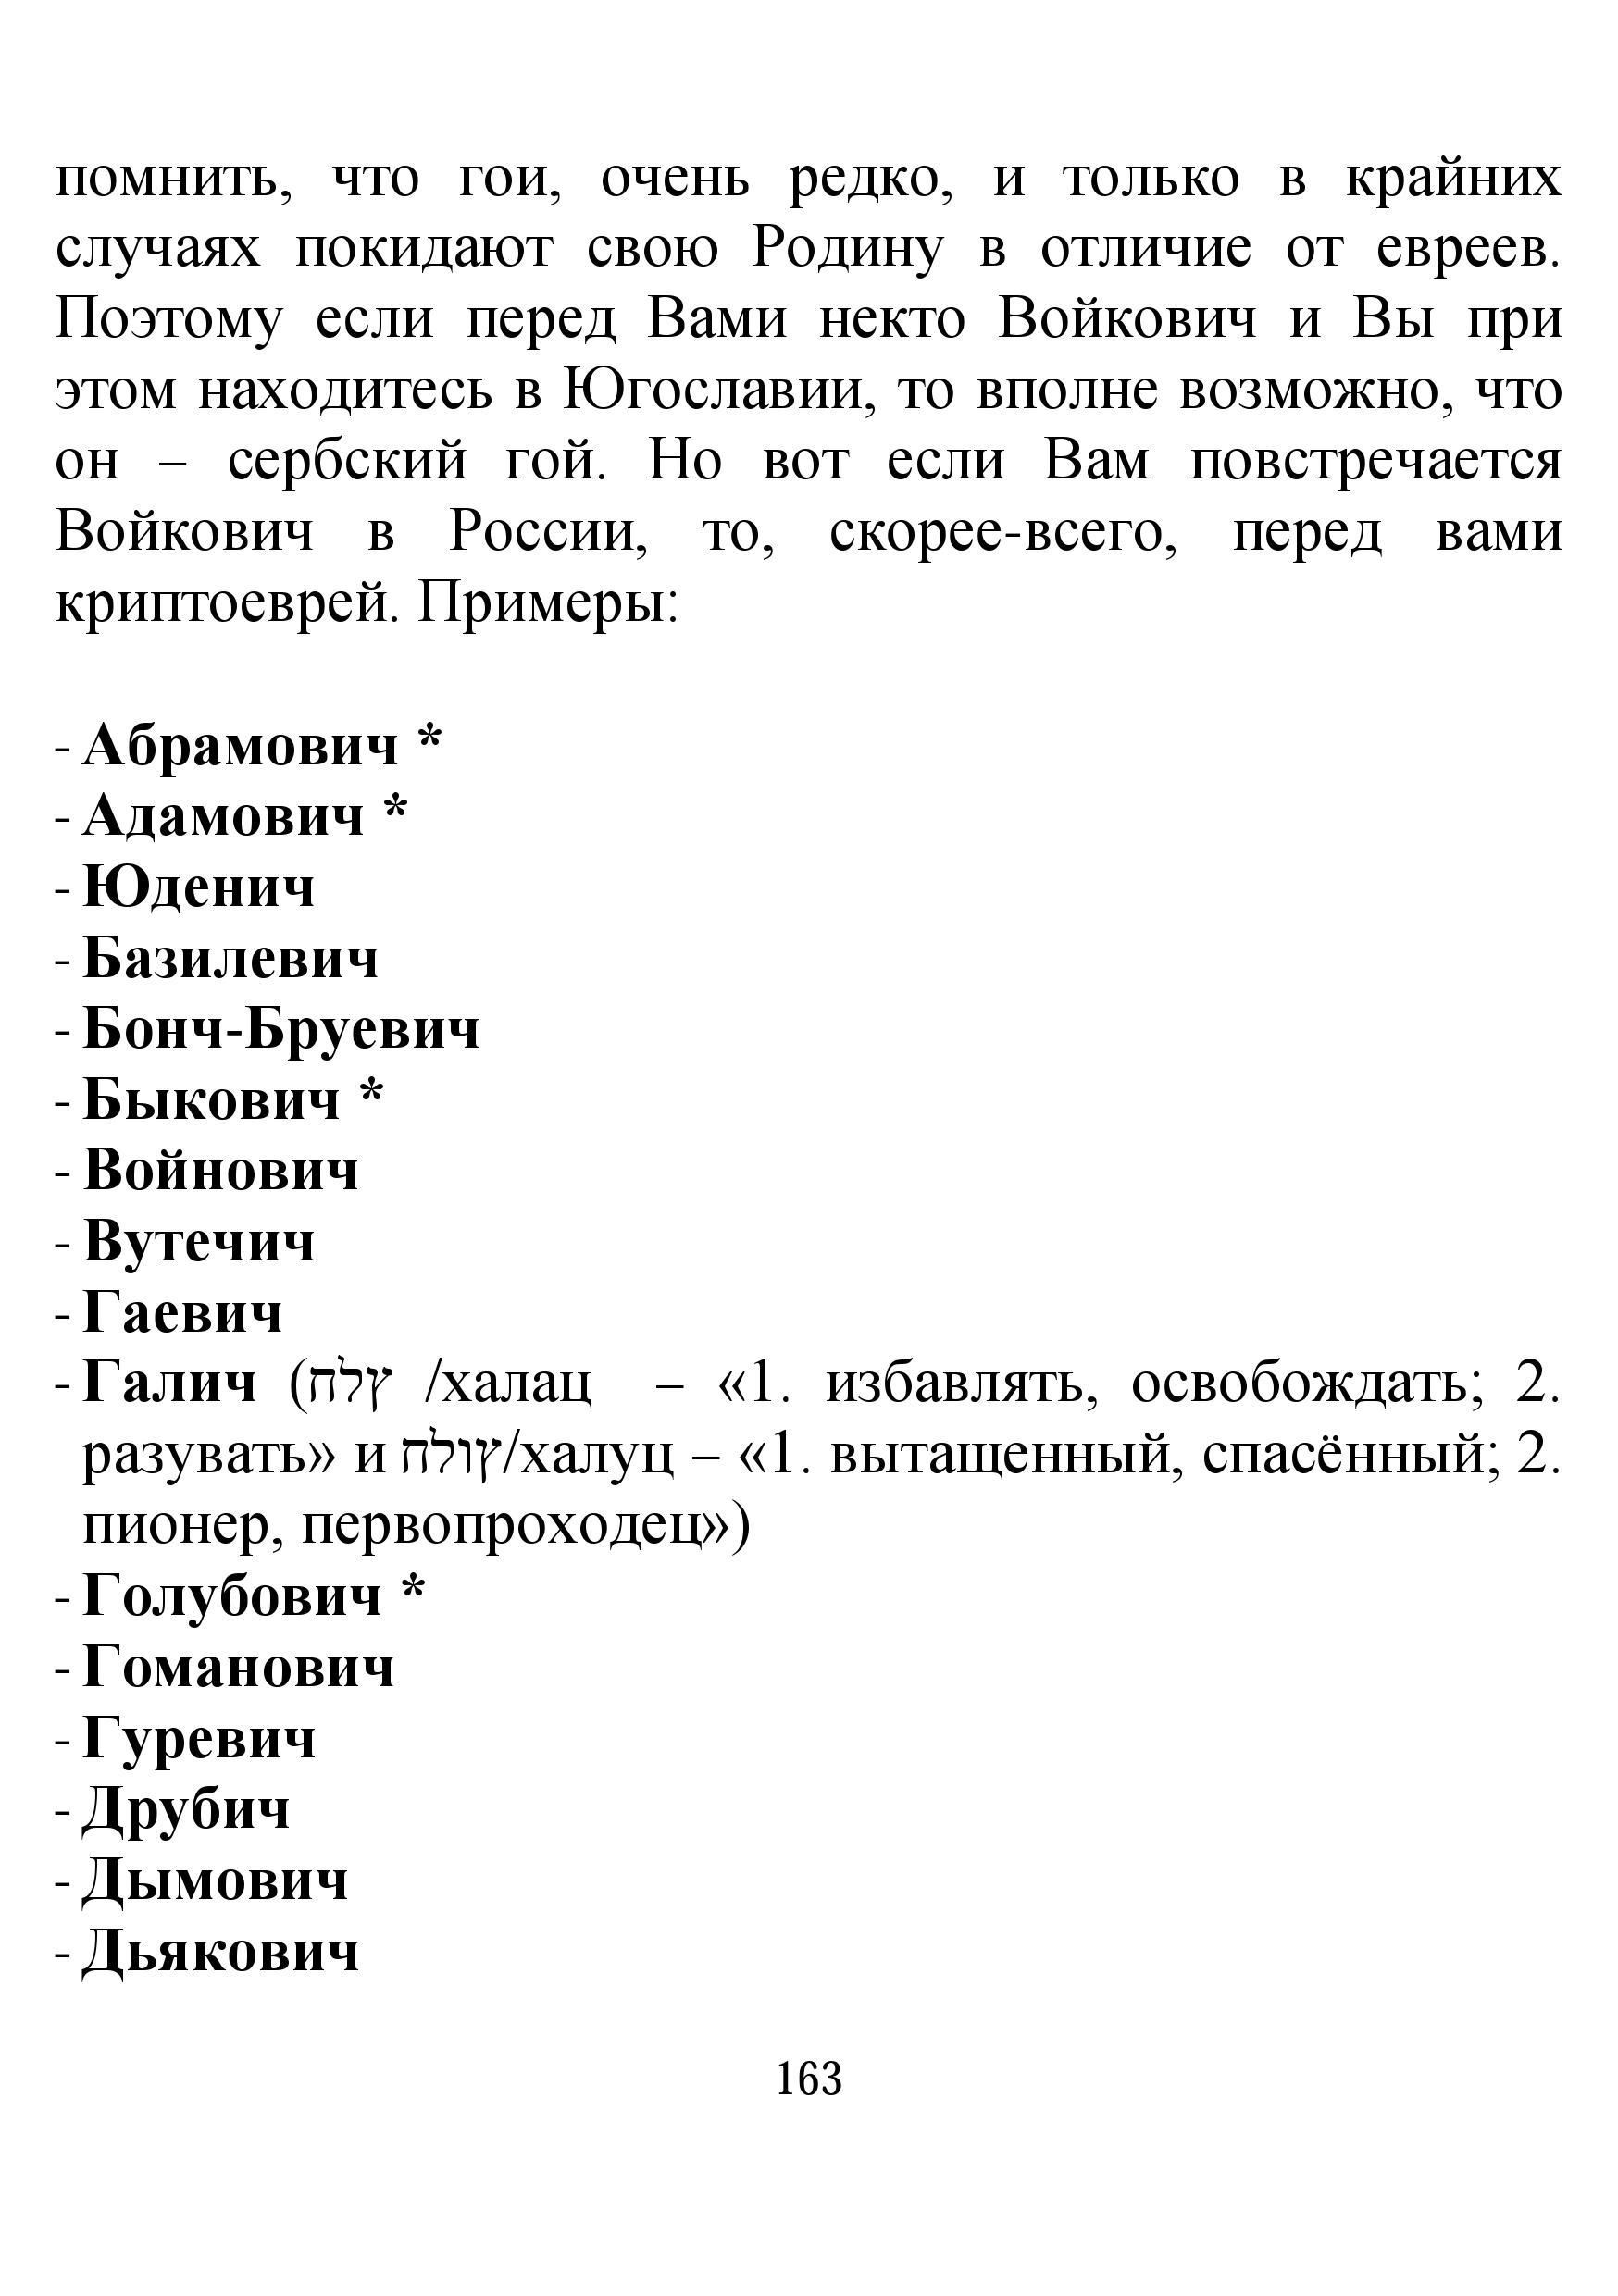 http://s0.uploads.ru/K2gS4.jpg